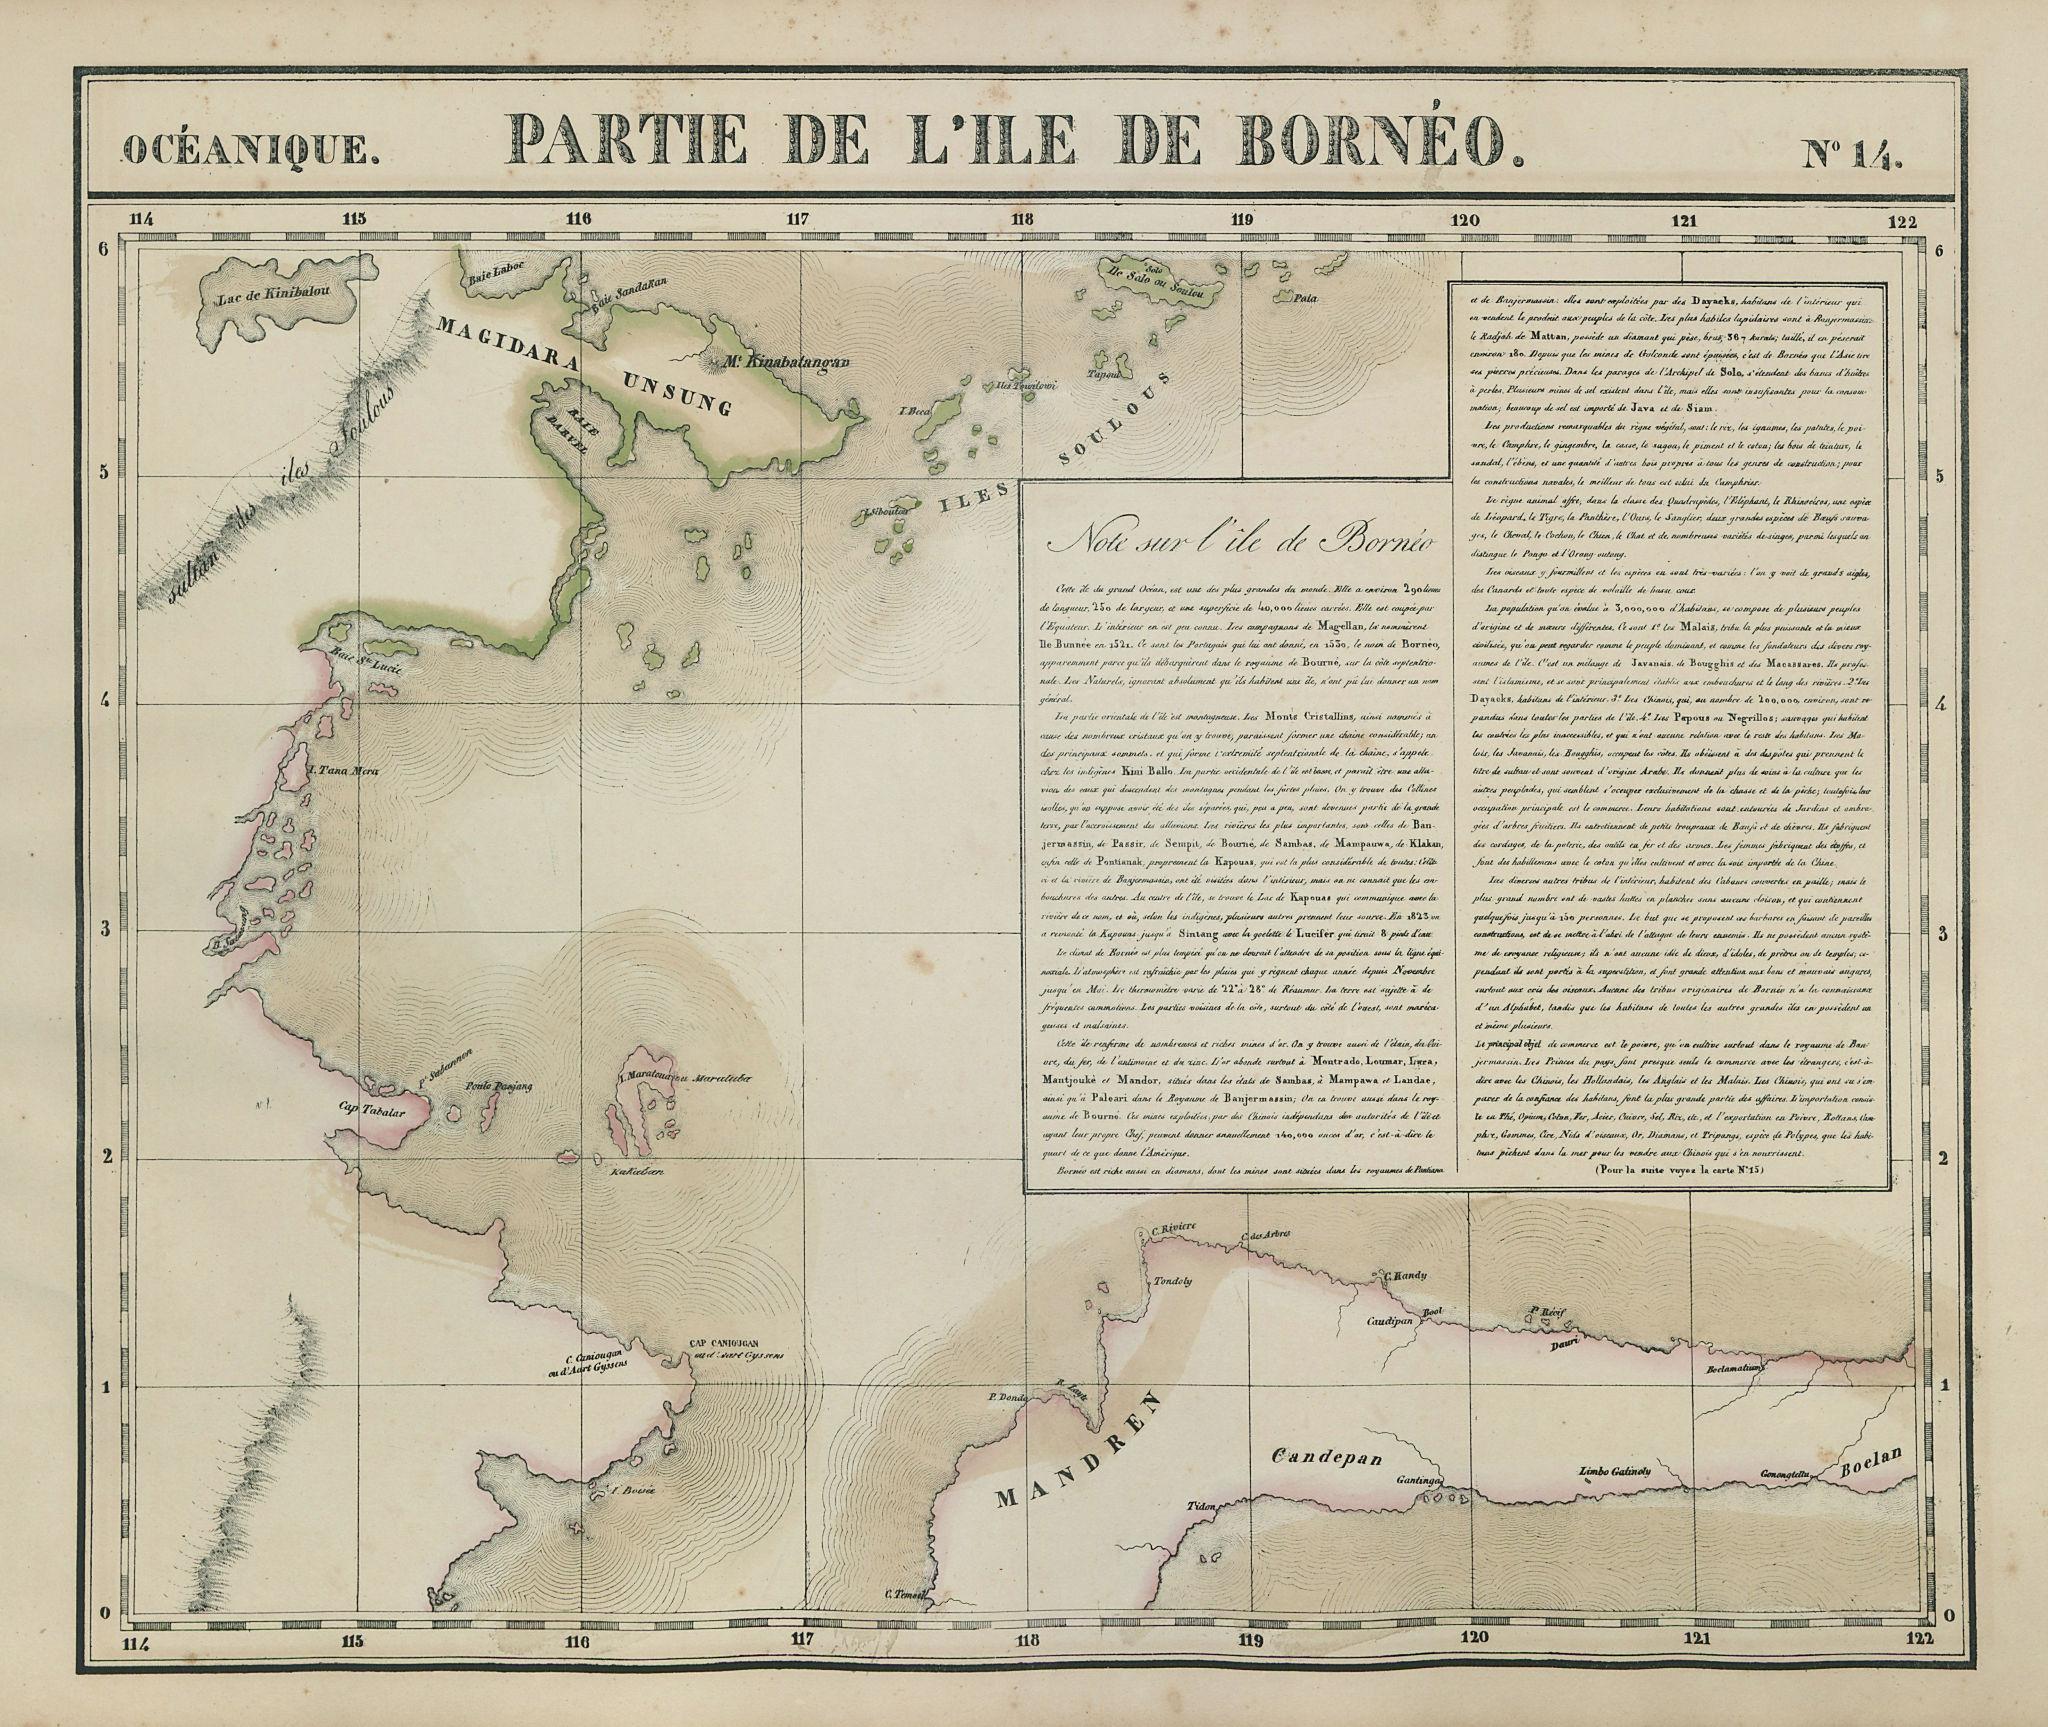 Océanique. Partie de l'Ile de Bornéo #14. Borneo Sulawesi. VANDERMAELEN 1827 map